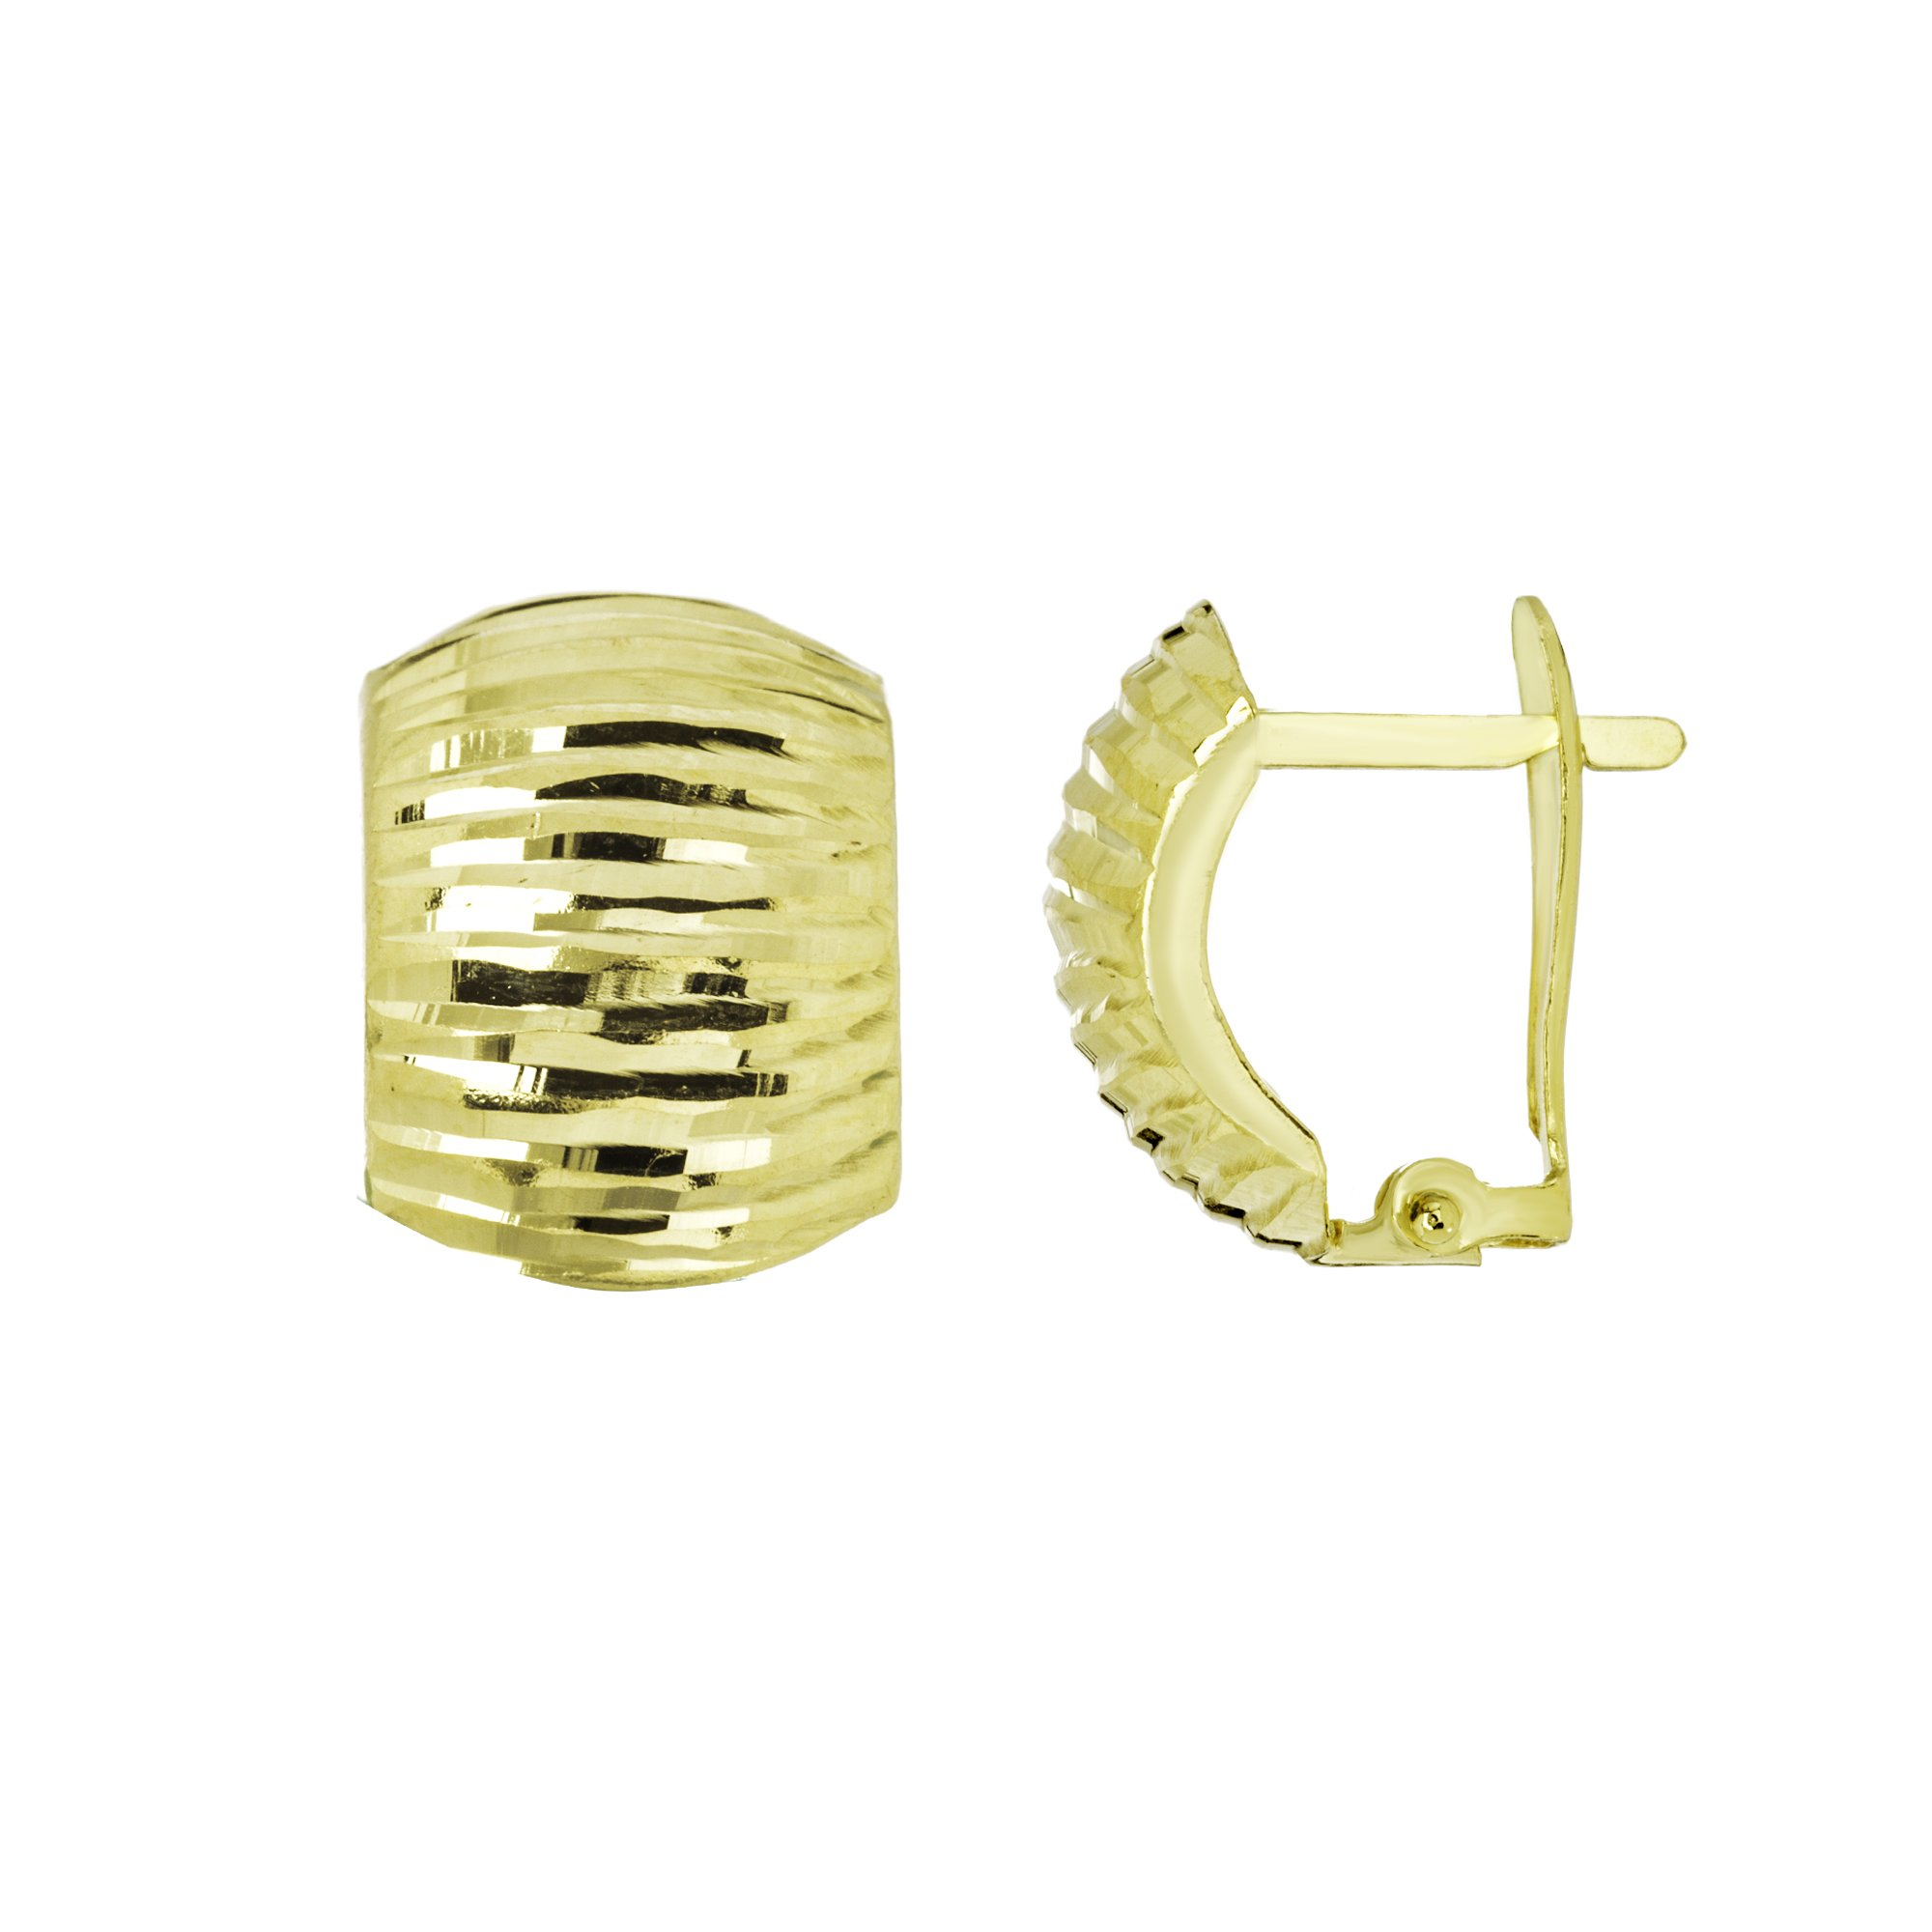 CLIP BACK EARRINGS, 10KT GOLD DIAMOND CUT DOMED CLIP BACK EARRINGS